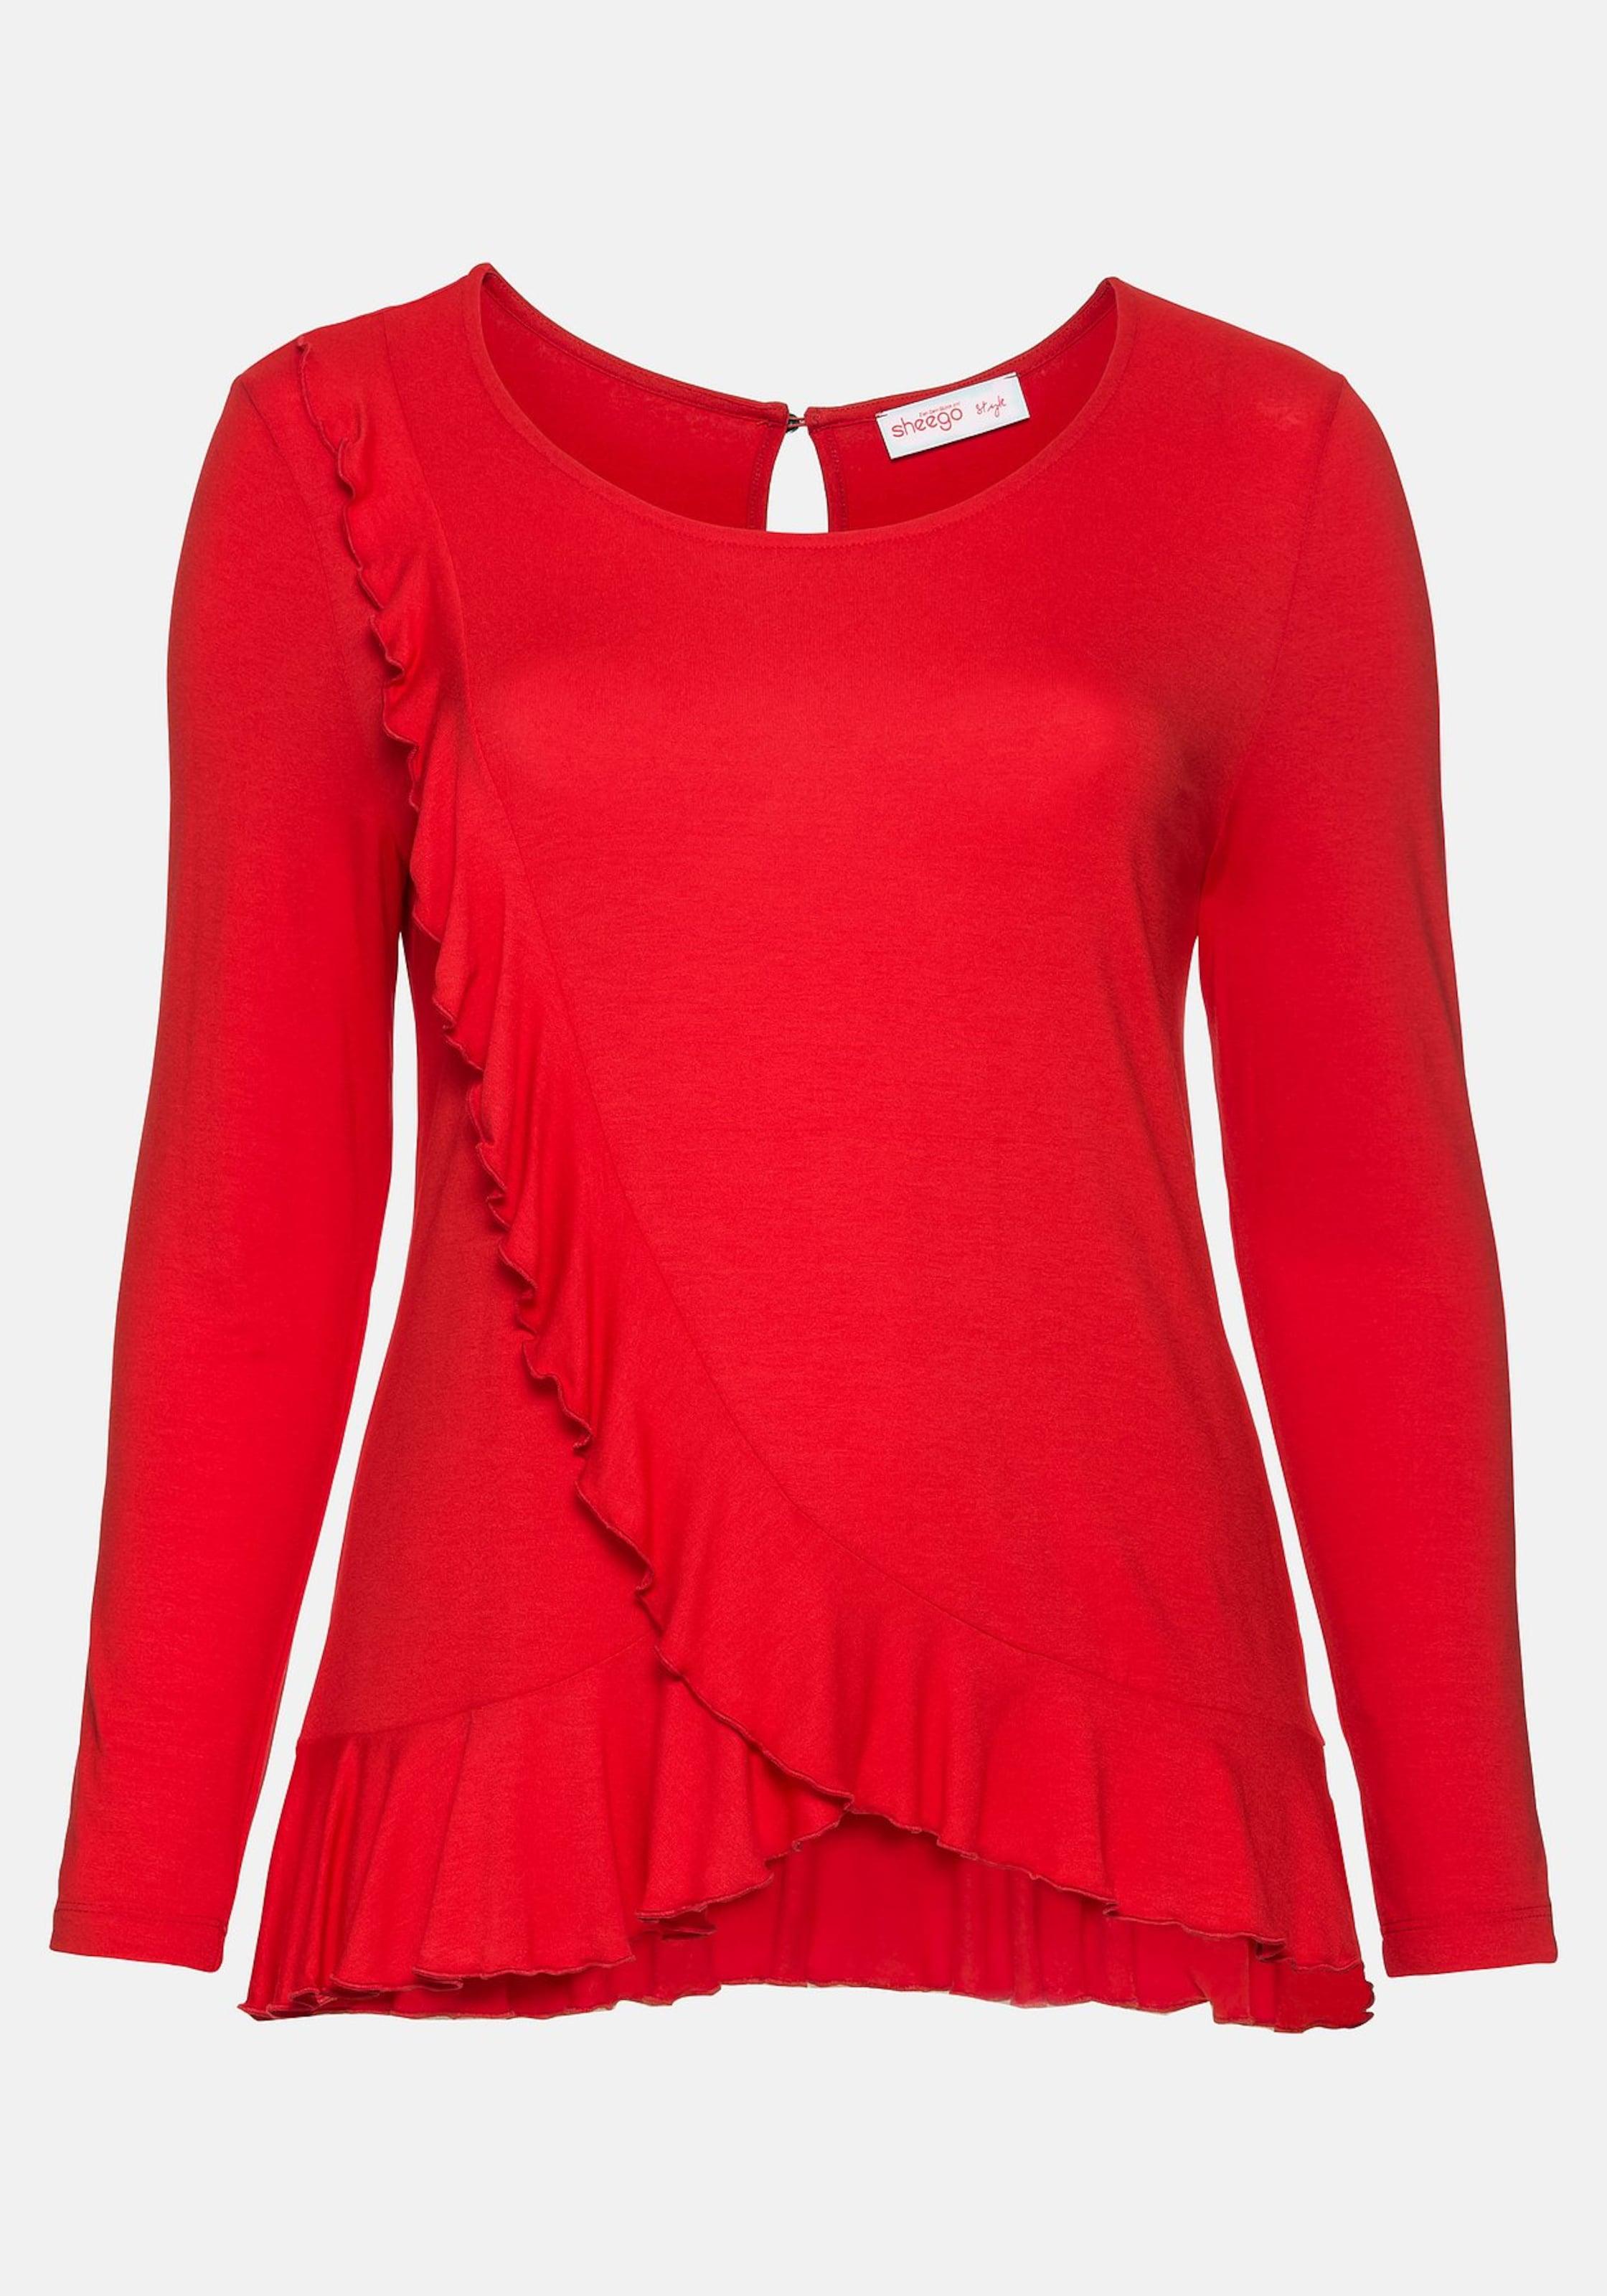 Shirt Sheego Shirt Sheego Rot Rot Shirt Sheego In In tsQCBhrdx